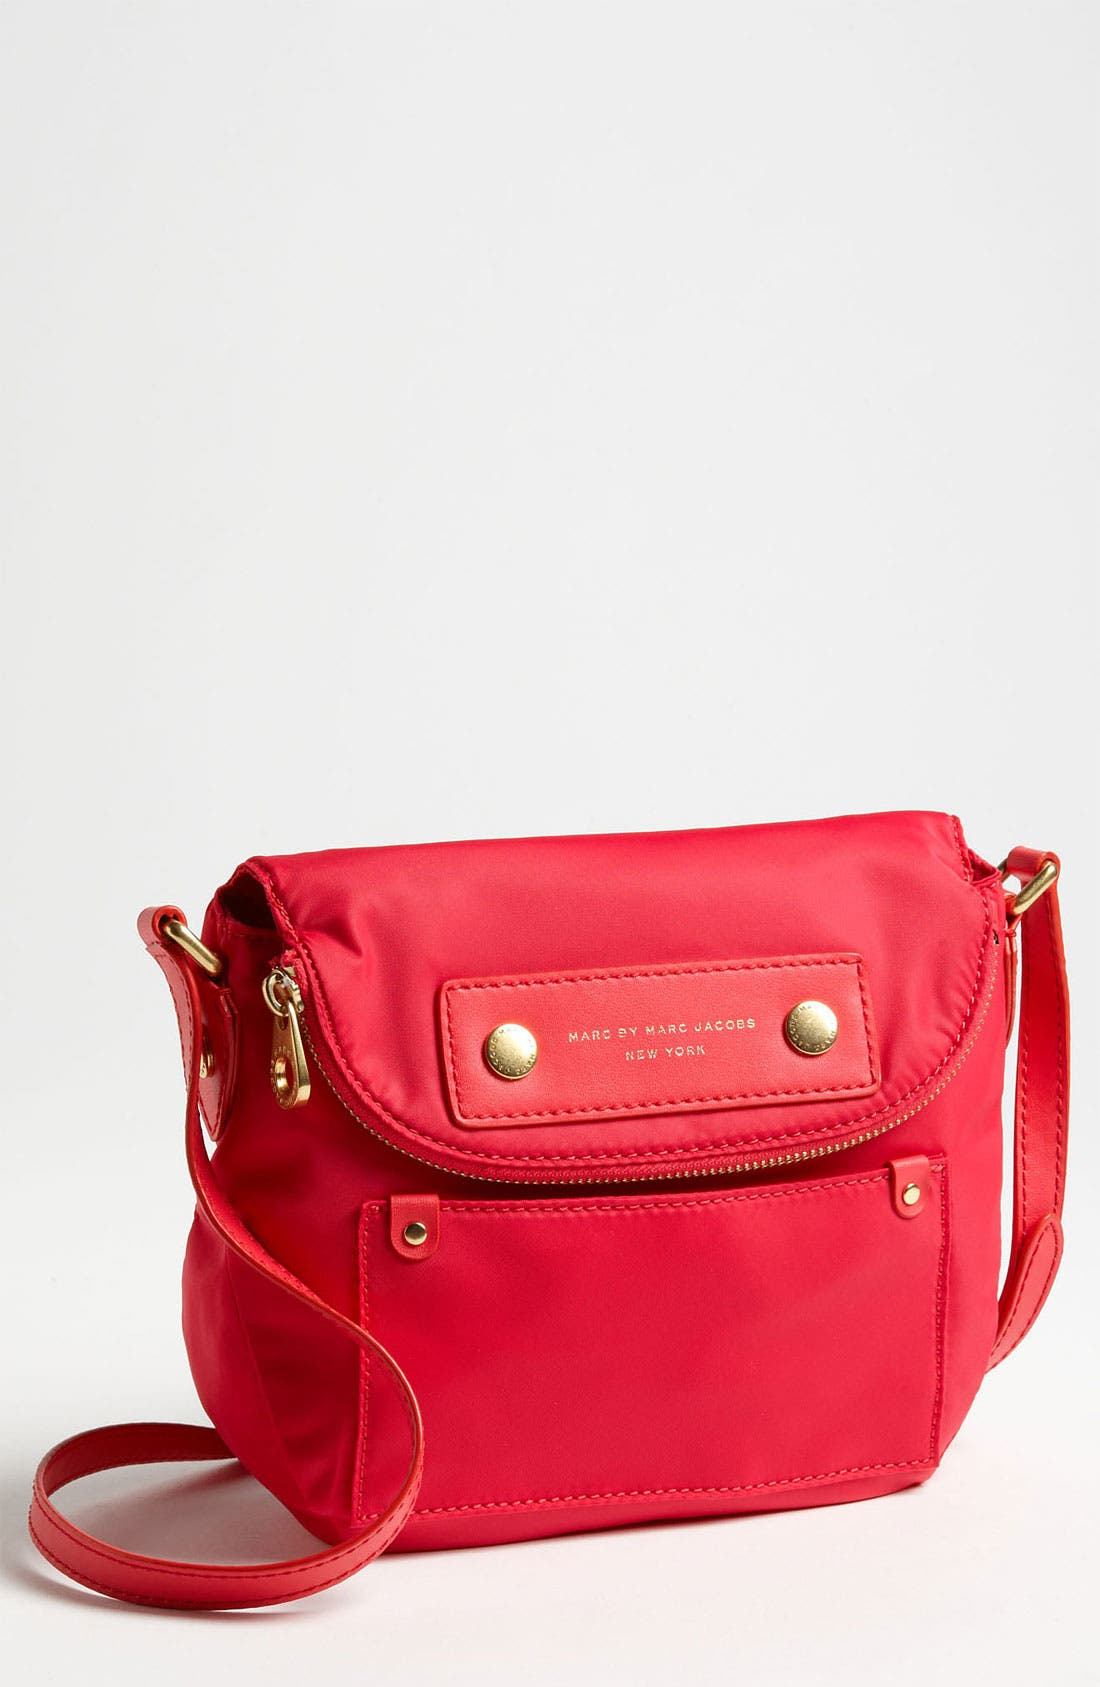 Alternate Image 1 Selected - MARC BY MARC JACOBS 'Preppy Nylon Natasha - Mini' Crossbody Bag